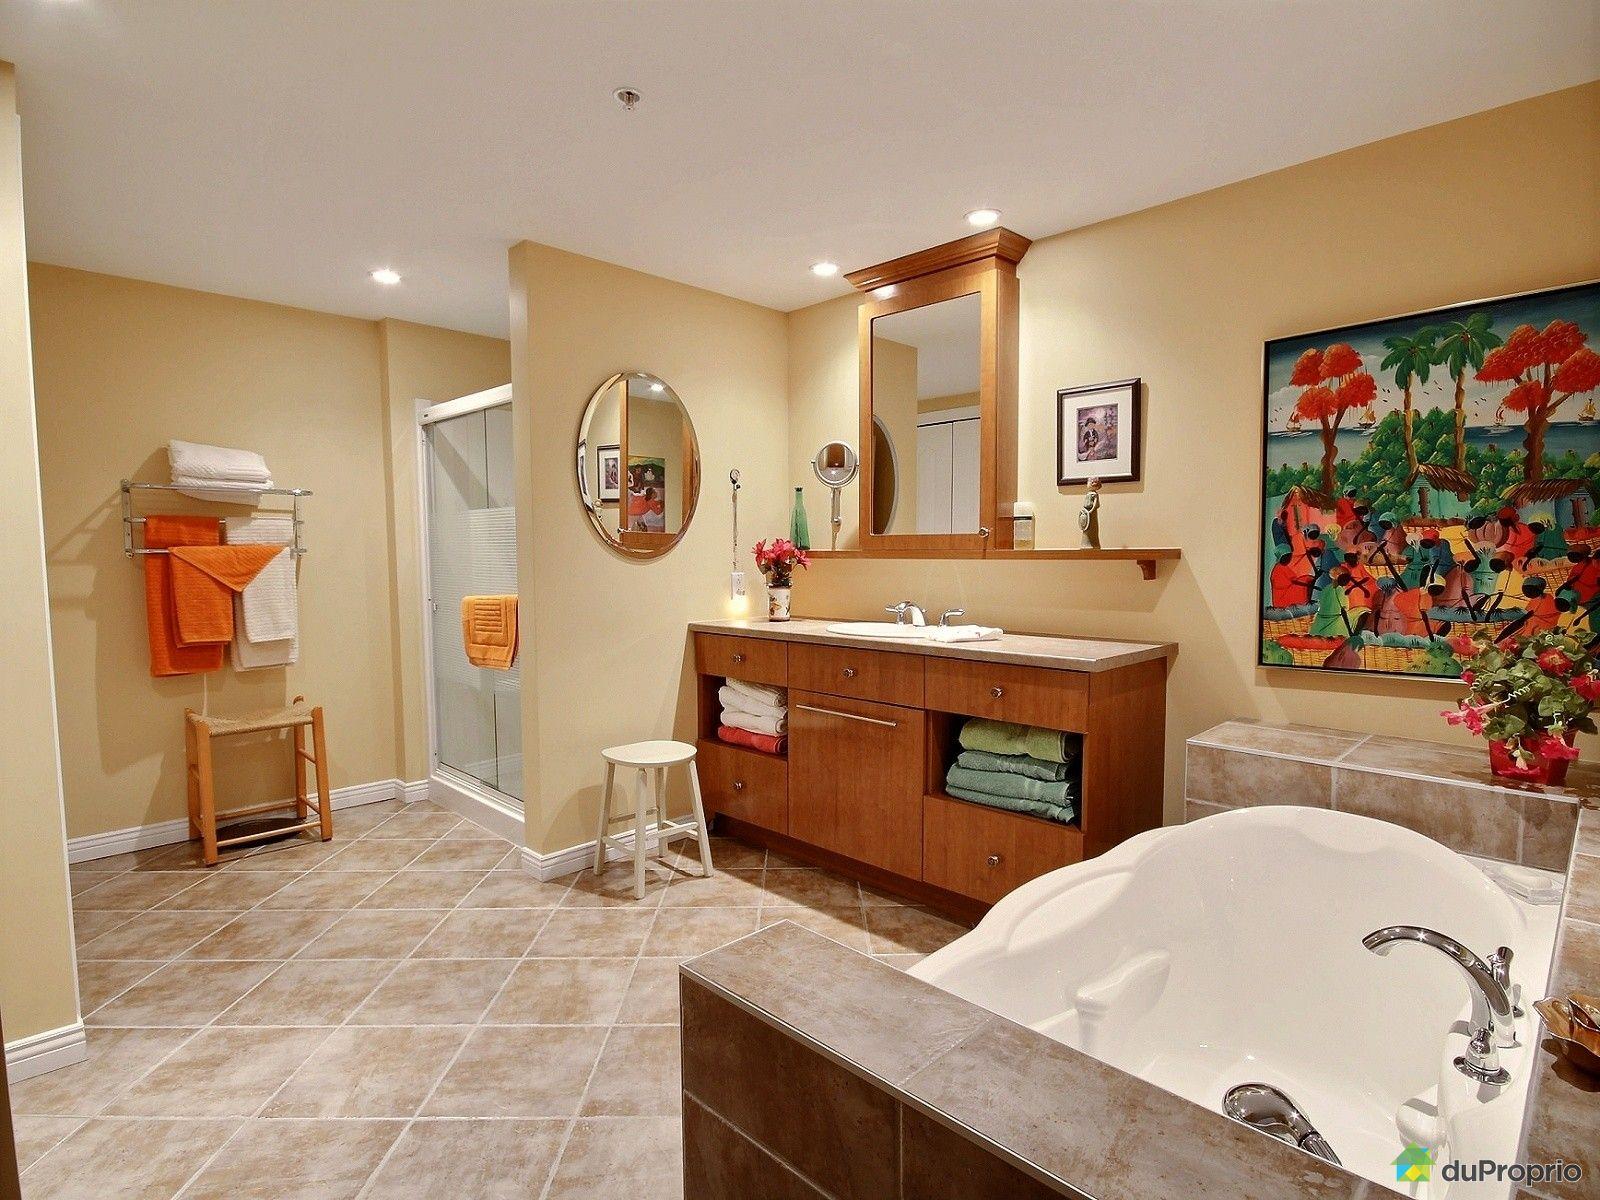 condo vendre ste foy 203 3796 rue gabrielle vall e immobilier qu bec duproprio 569894. Black Bedroom Furniture Sets. Home Design Ideas